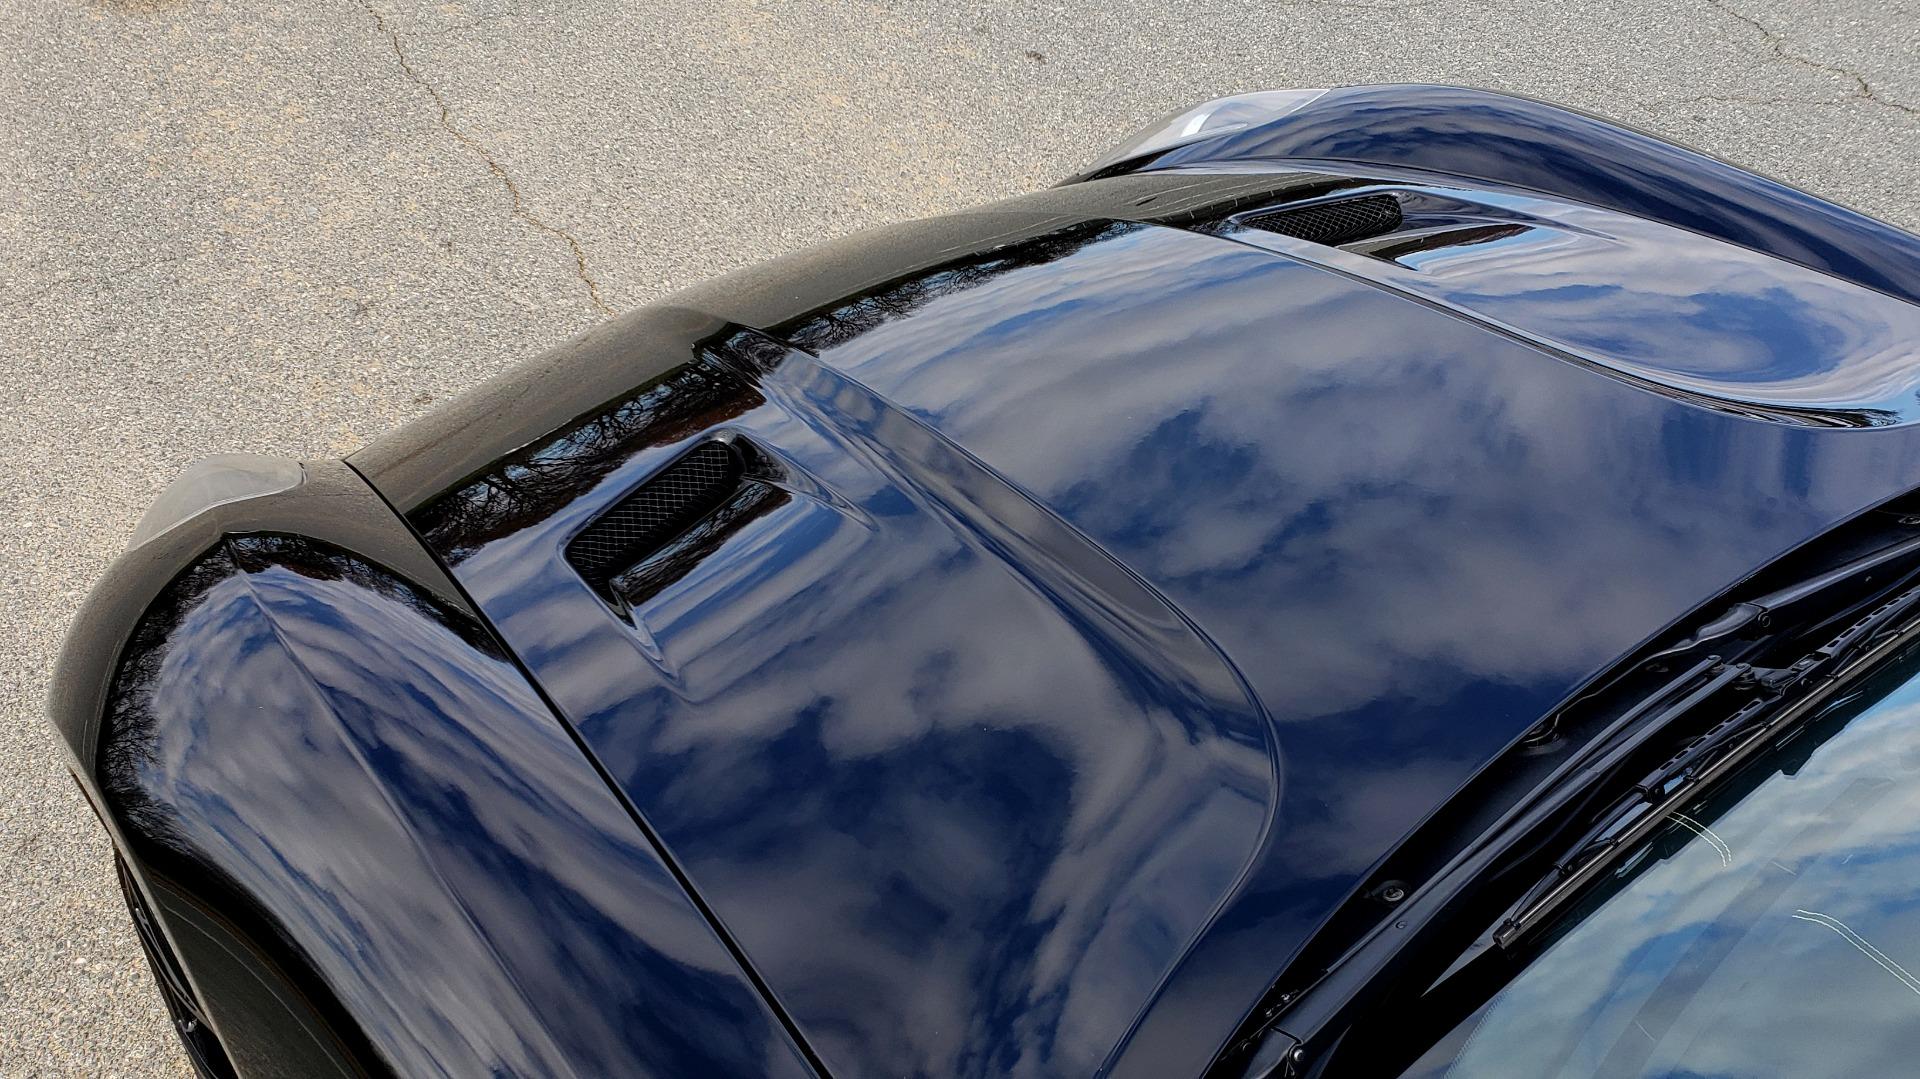 Used 2007 Ferrari 599 GTB FIORANO HGTE / V12 / F1 TRANS / NAV / BOSE / CUSTOM WHEELS for sale $109,999 at Formula Imports in Charlotte NC 28227 55